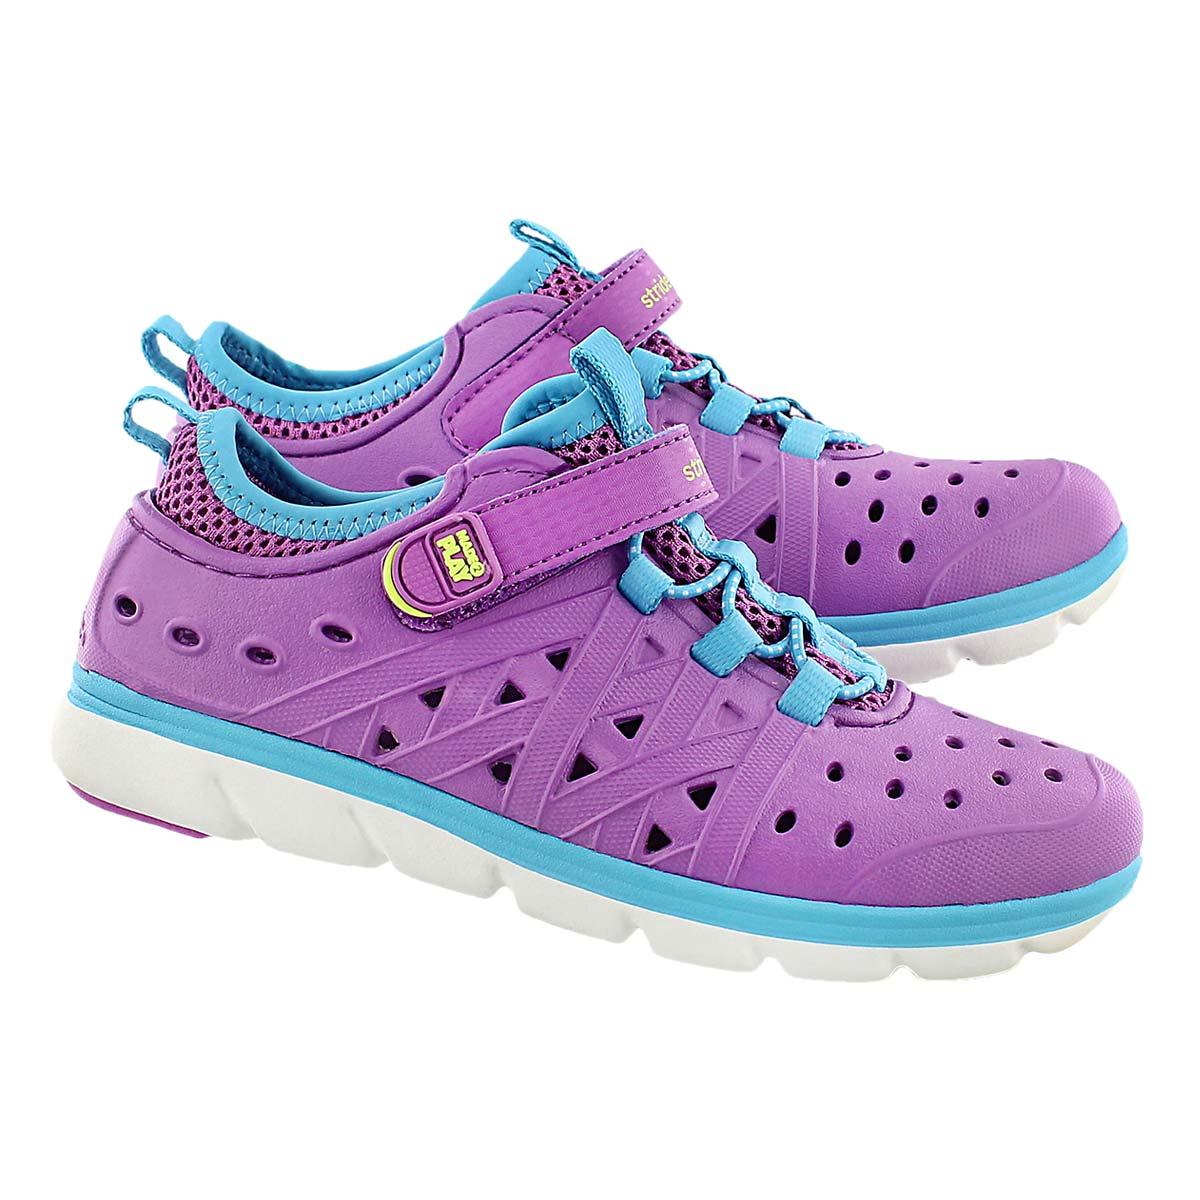 Inf M2P Phibian purple sneaker